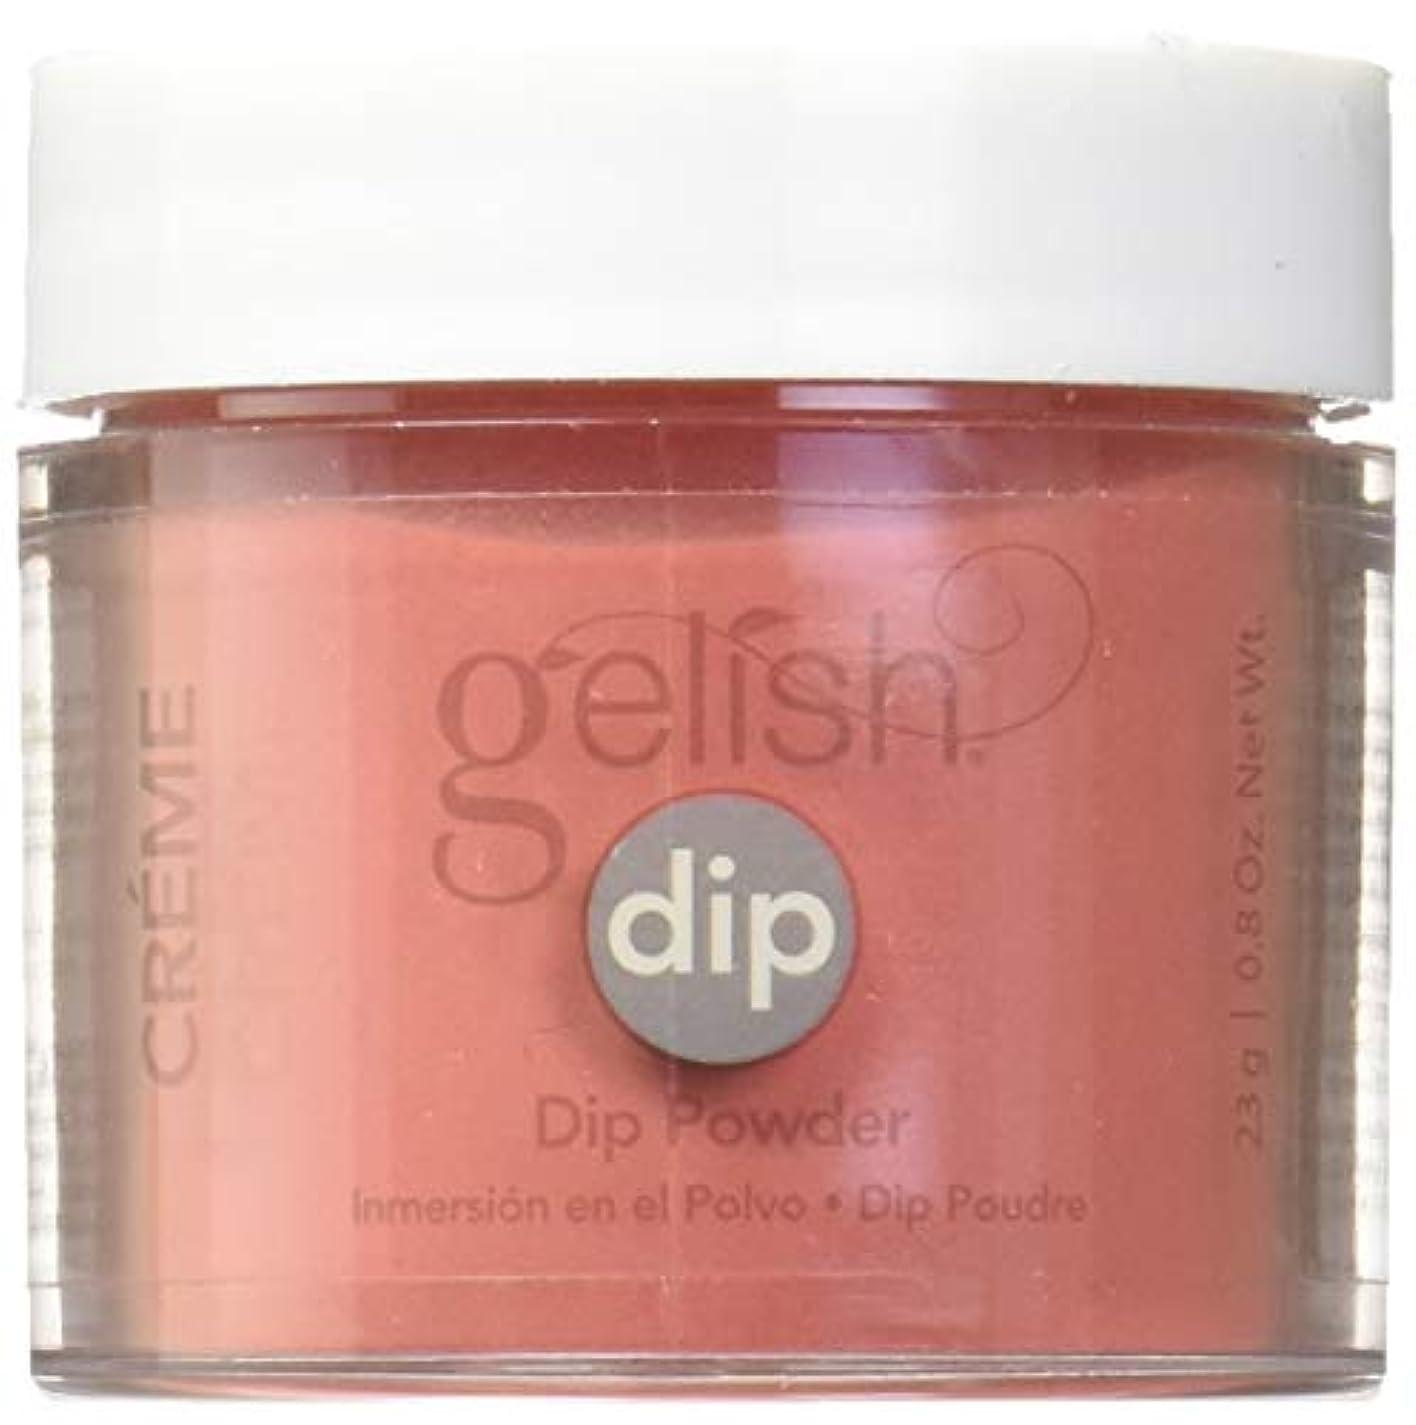 強度再集計批判的Harmony Gelish - Acrylic Dip Powder - Fire Cracker - 23g / 0.8oz